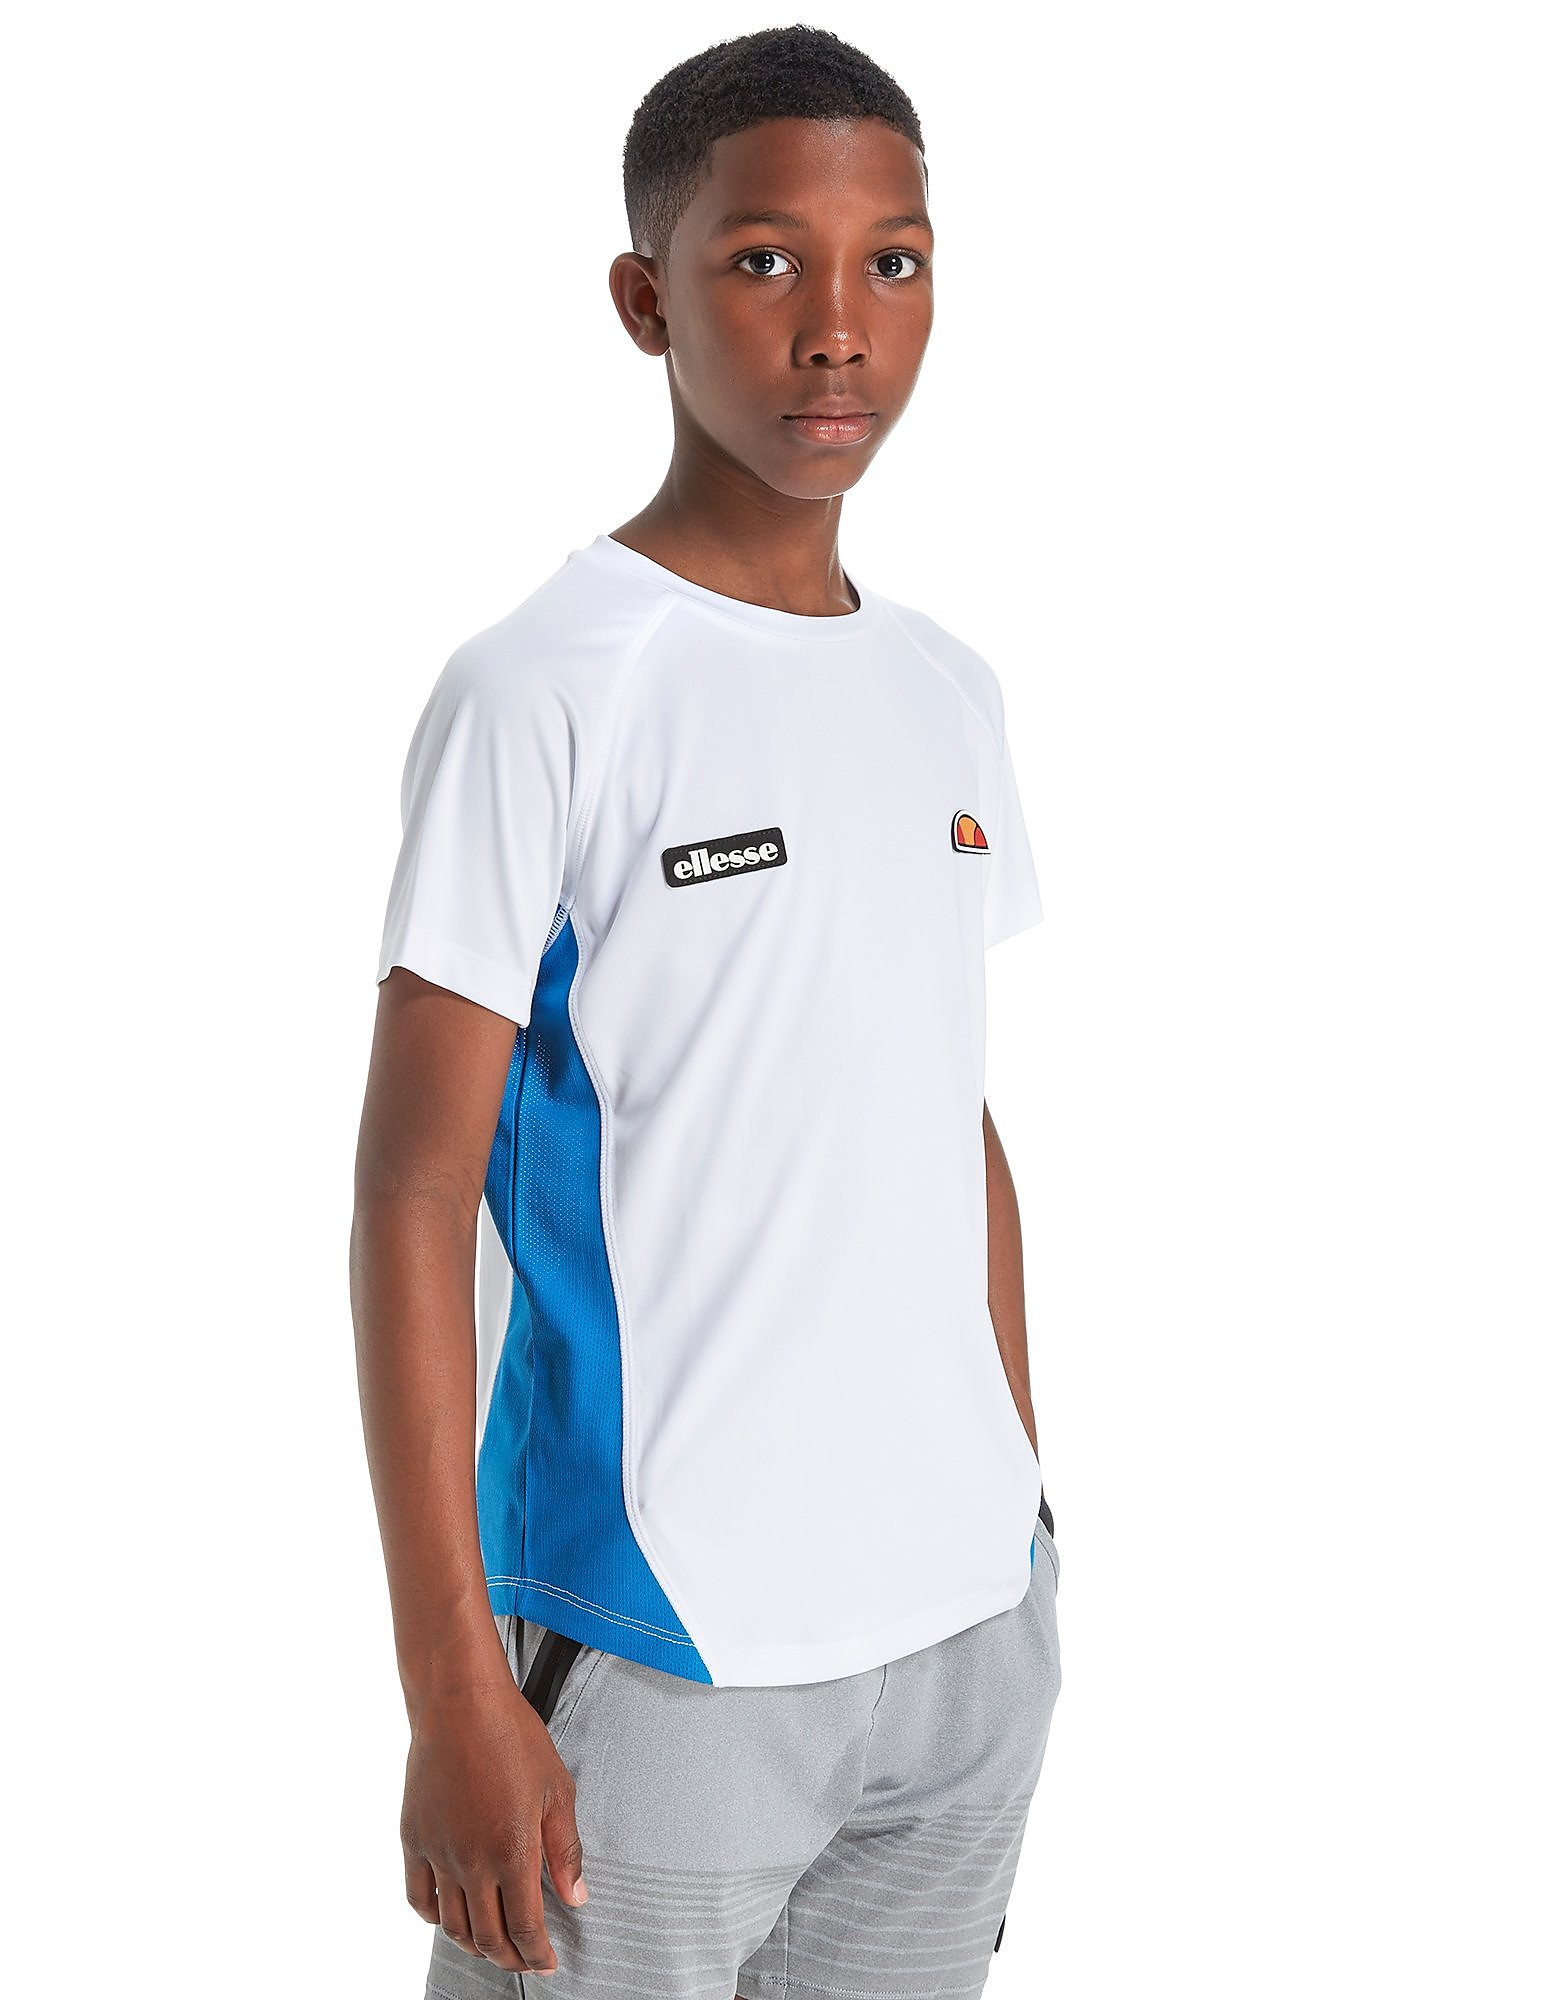 Ellesse Veron Sport T-Shirt Junior